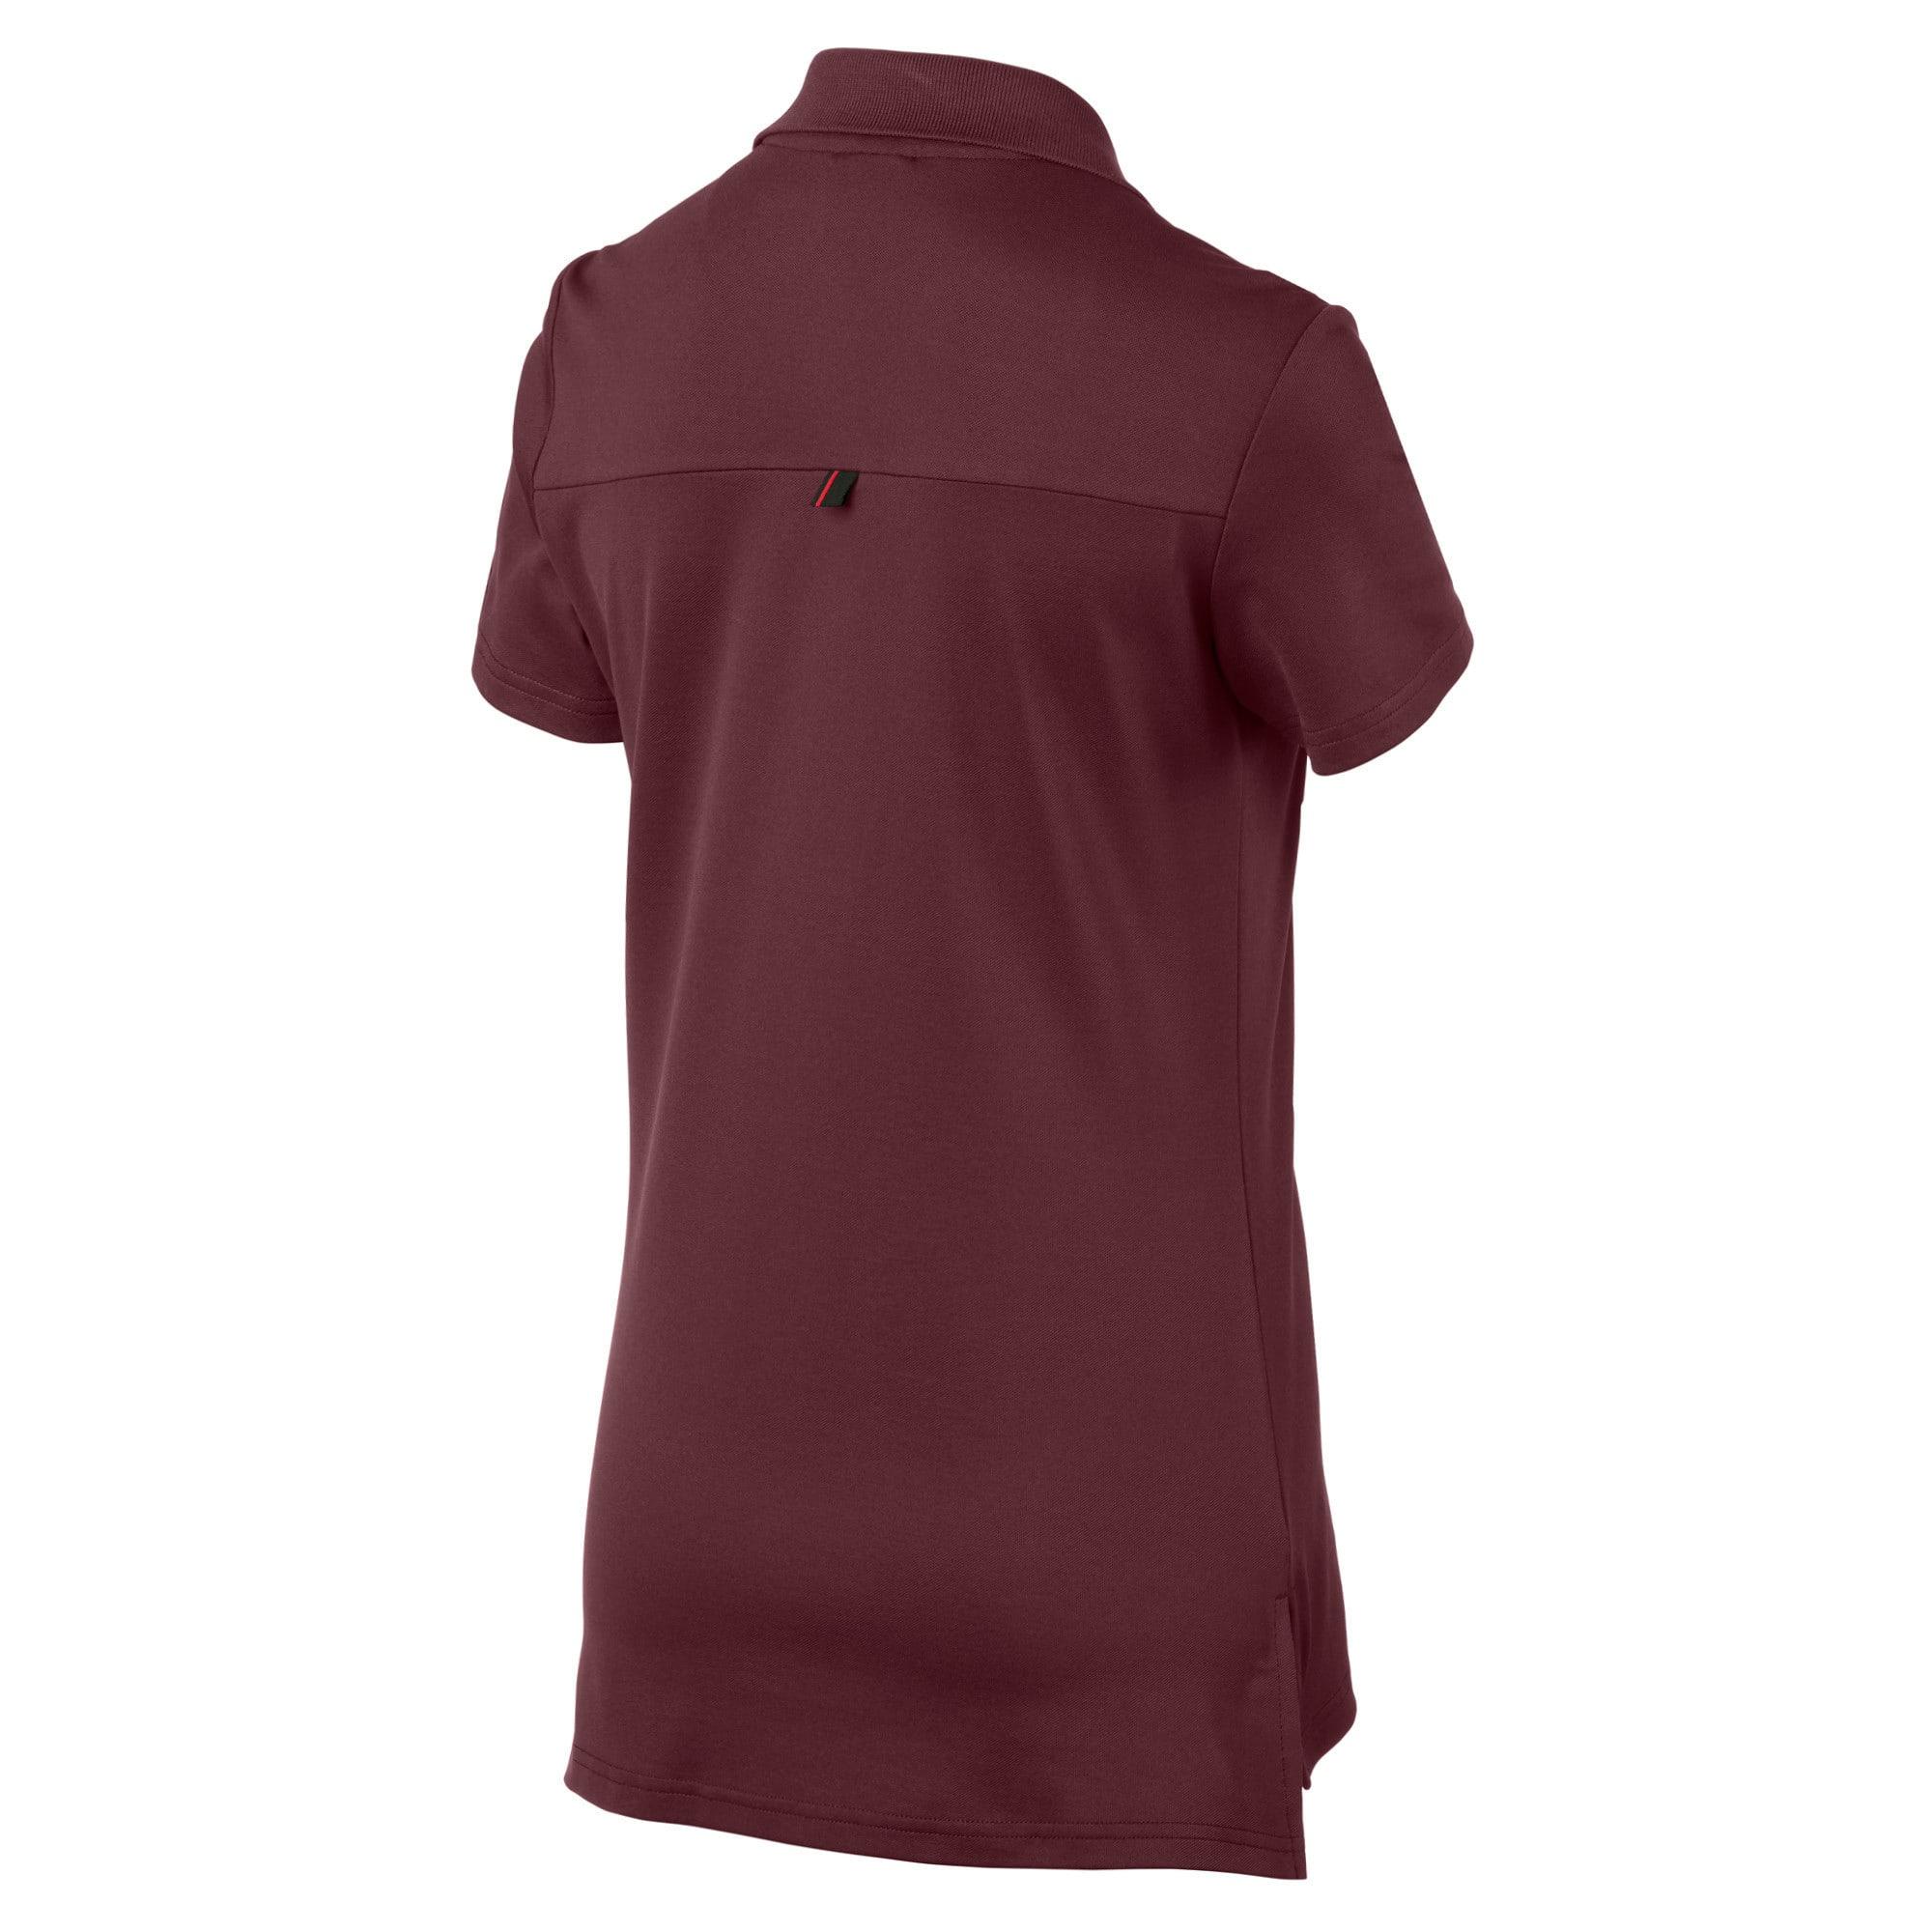 Thumbnail 5 of Ferrari Women's Polo Shirt, Vineyard Wine, medium